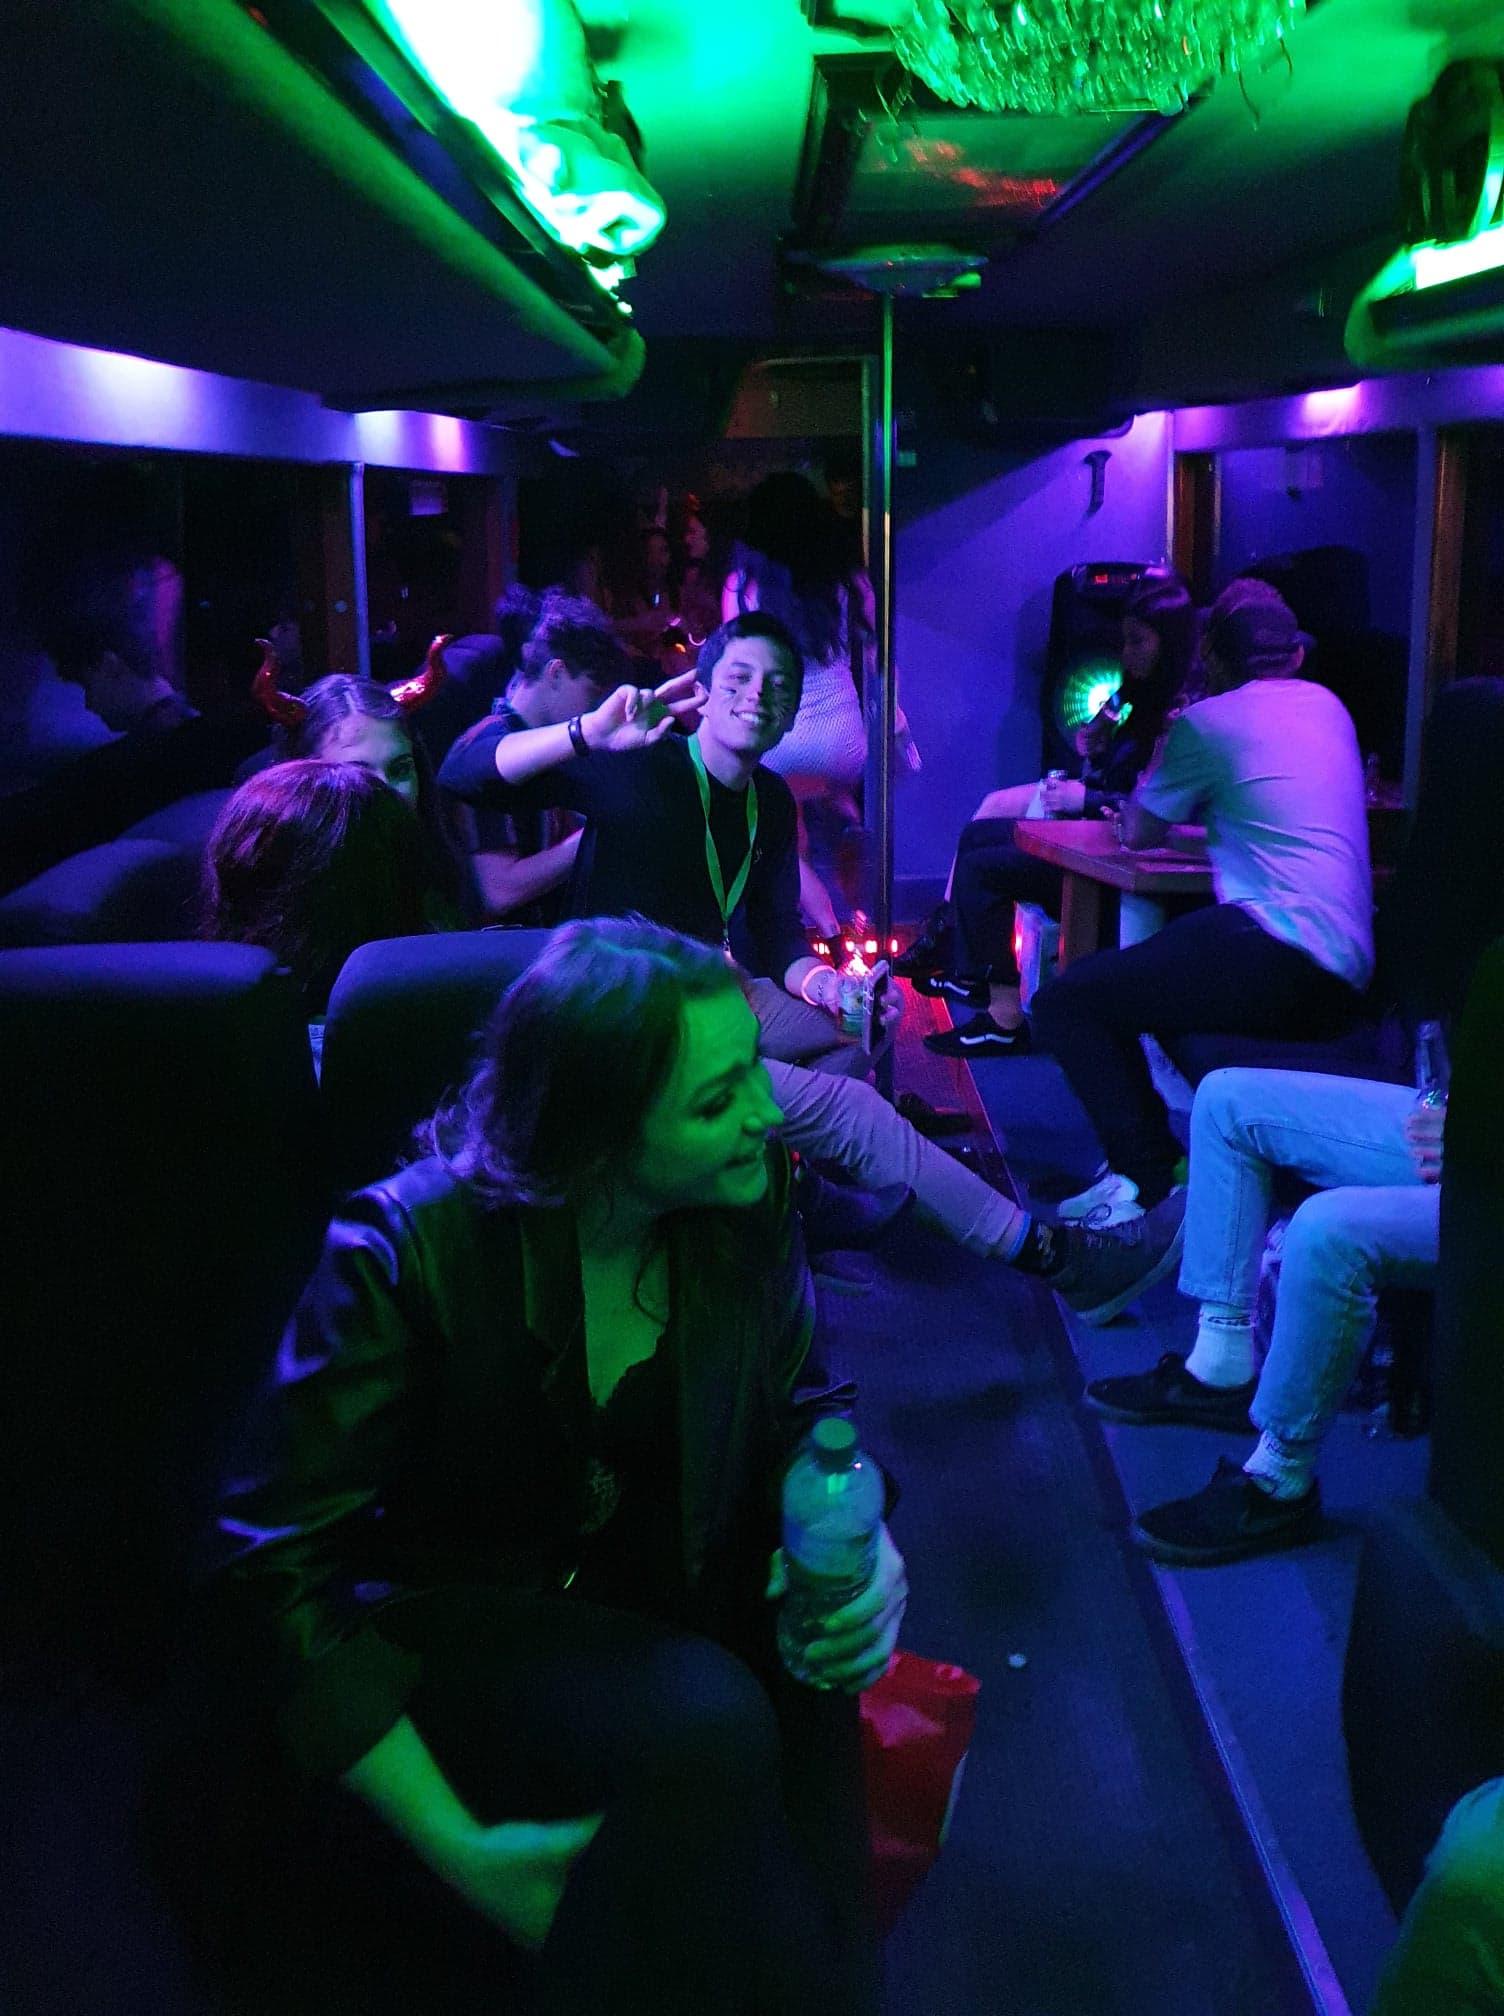 party-bus-fun.jpg